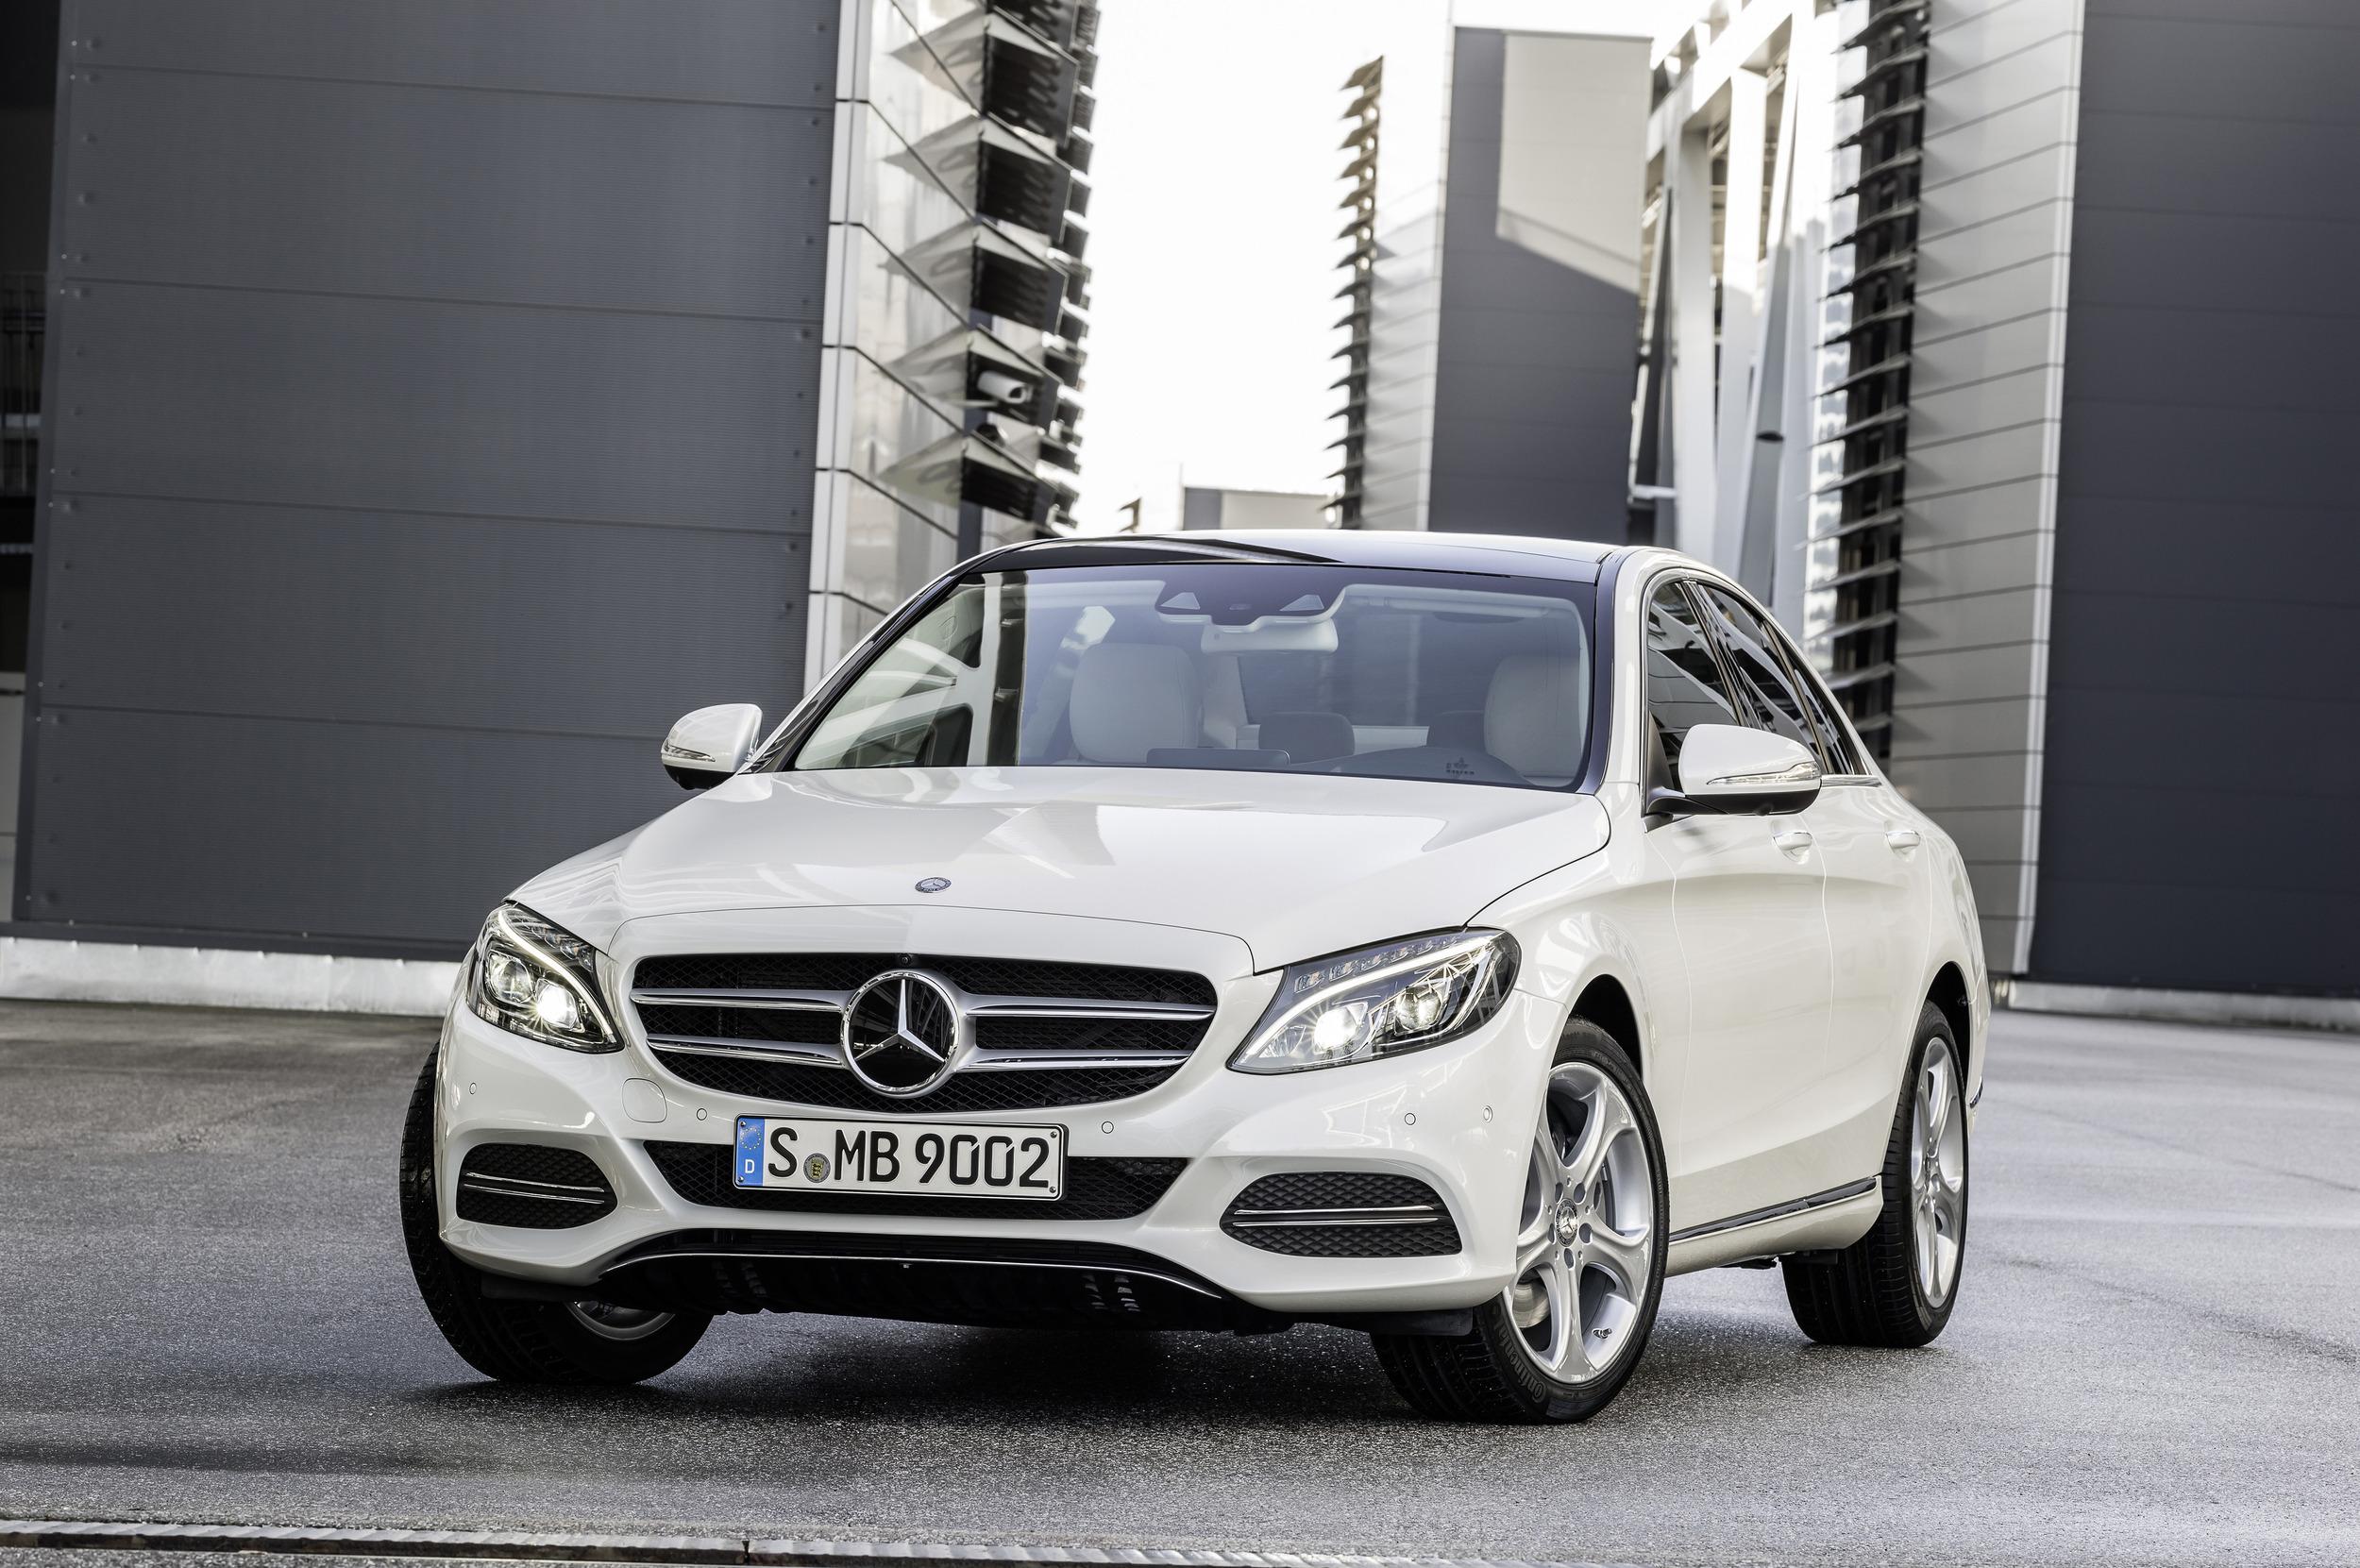 Mercedes CLase C 2014 28